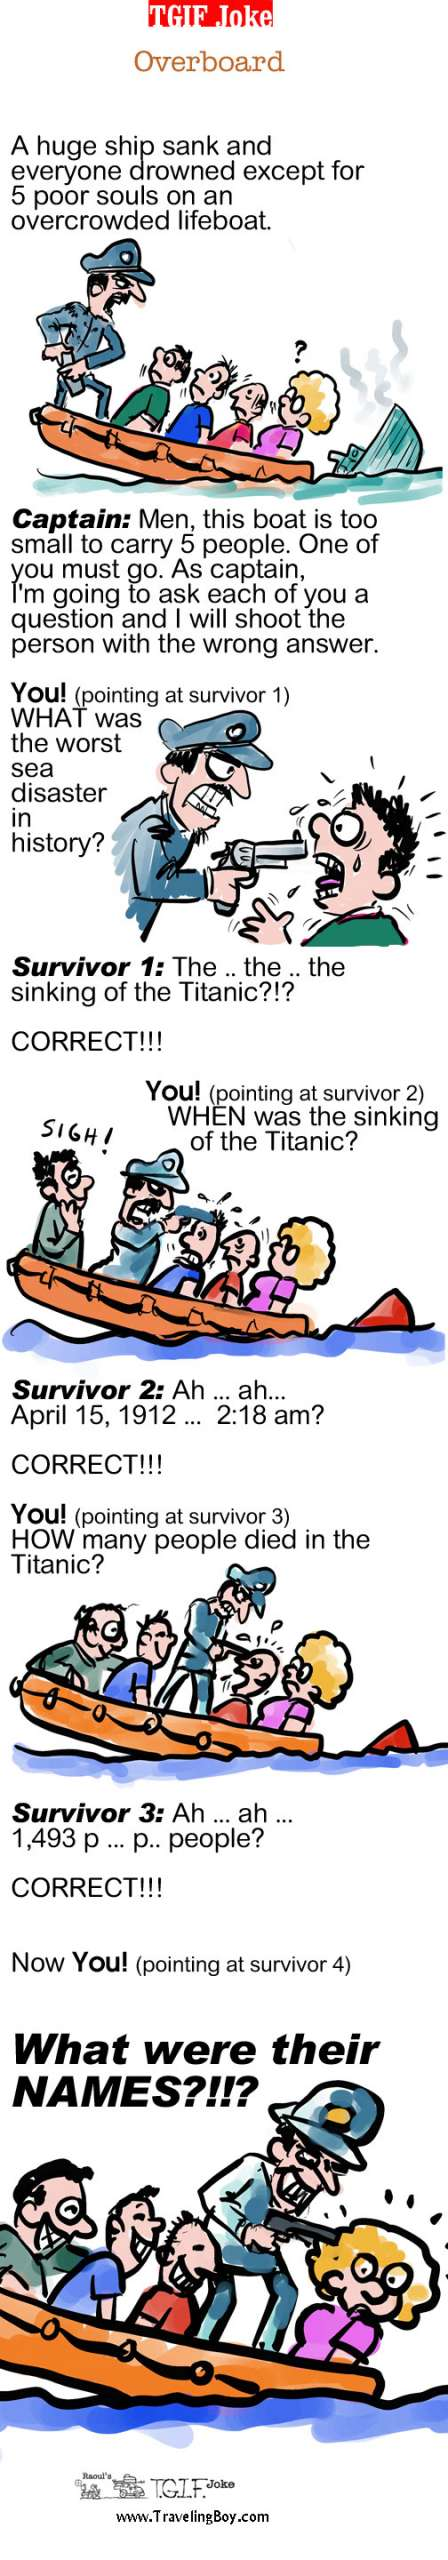 The Titanic Joke